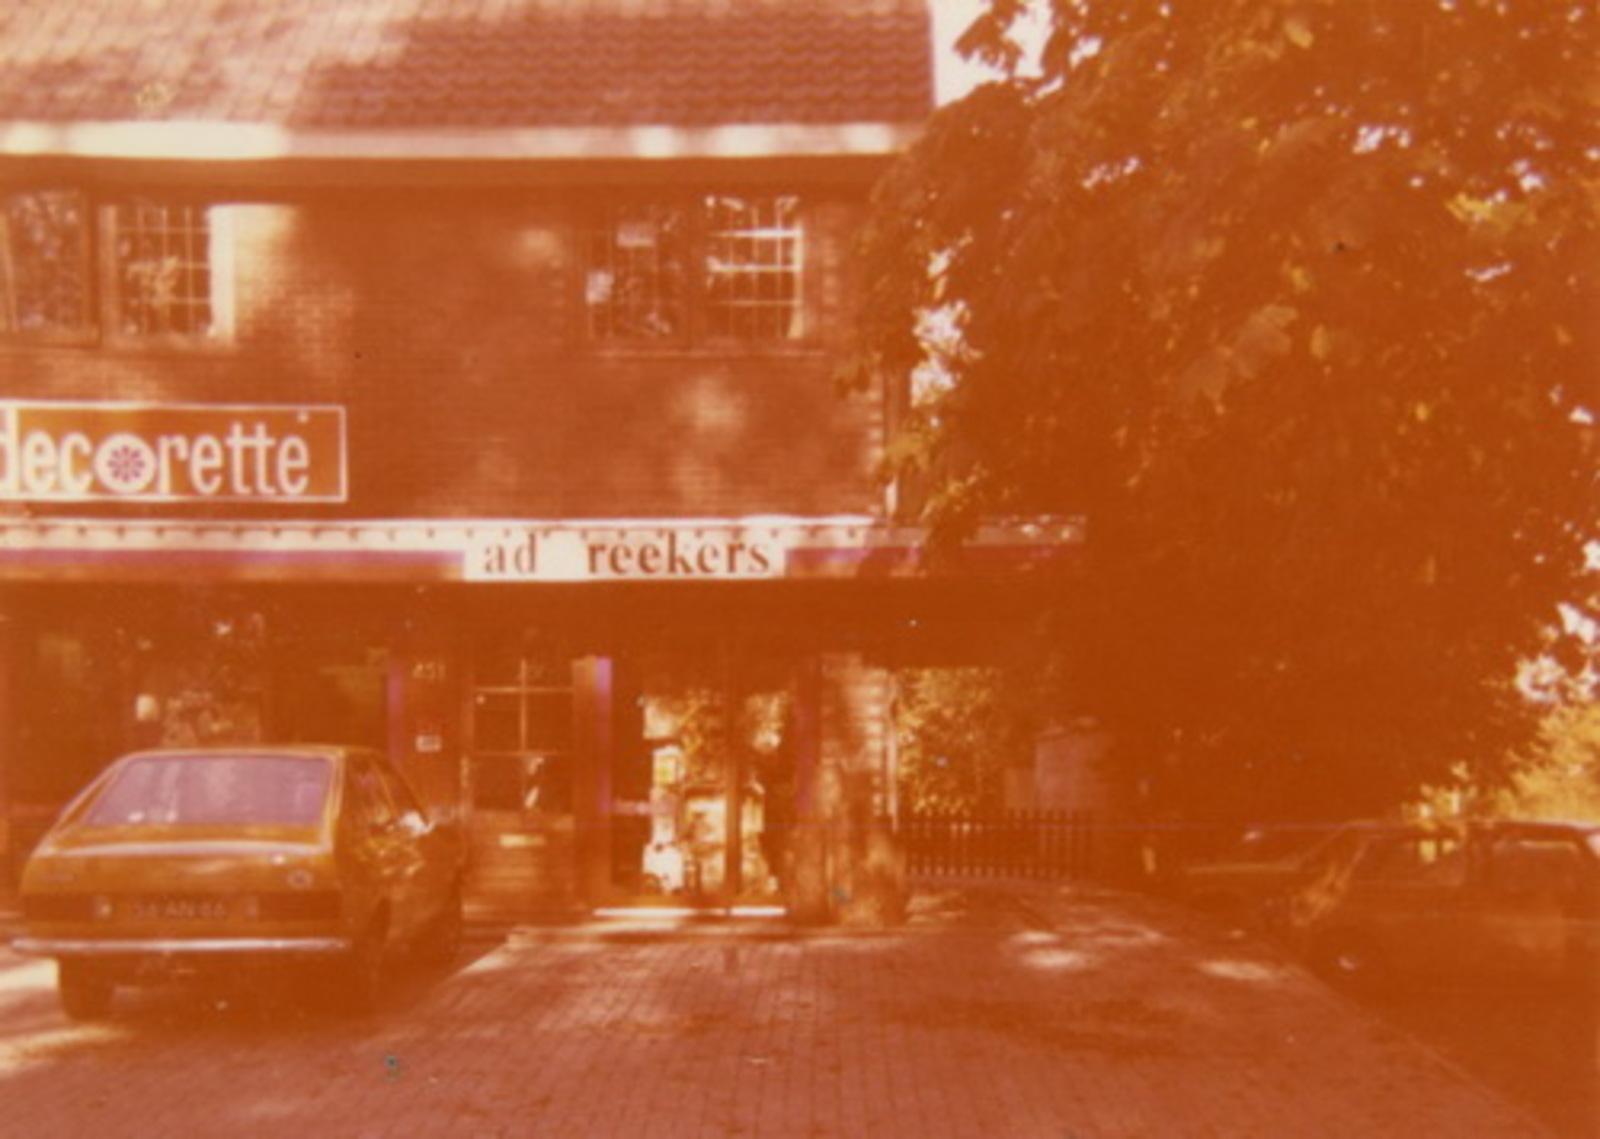 Venneperweg N 0431 1977+ winkel Decorette v Ad Reekers